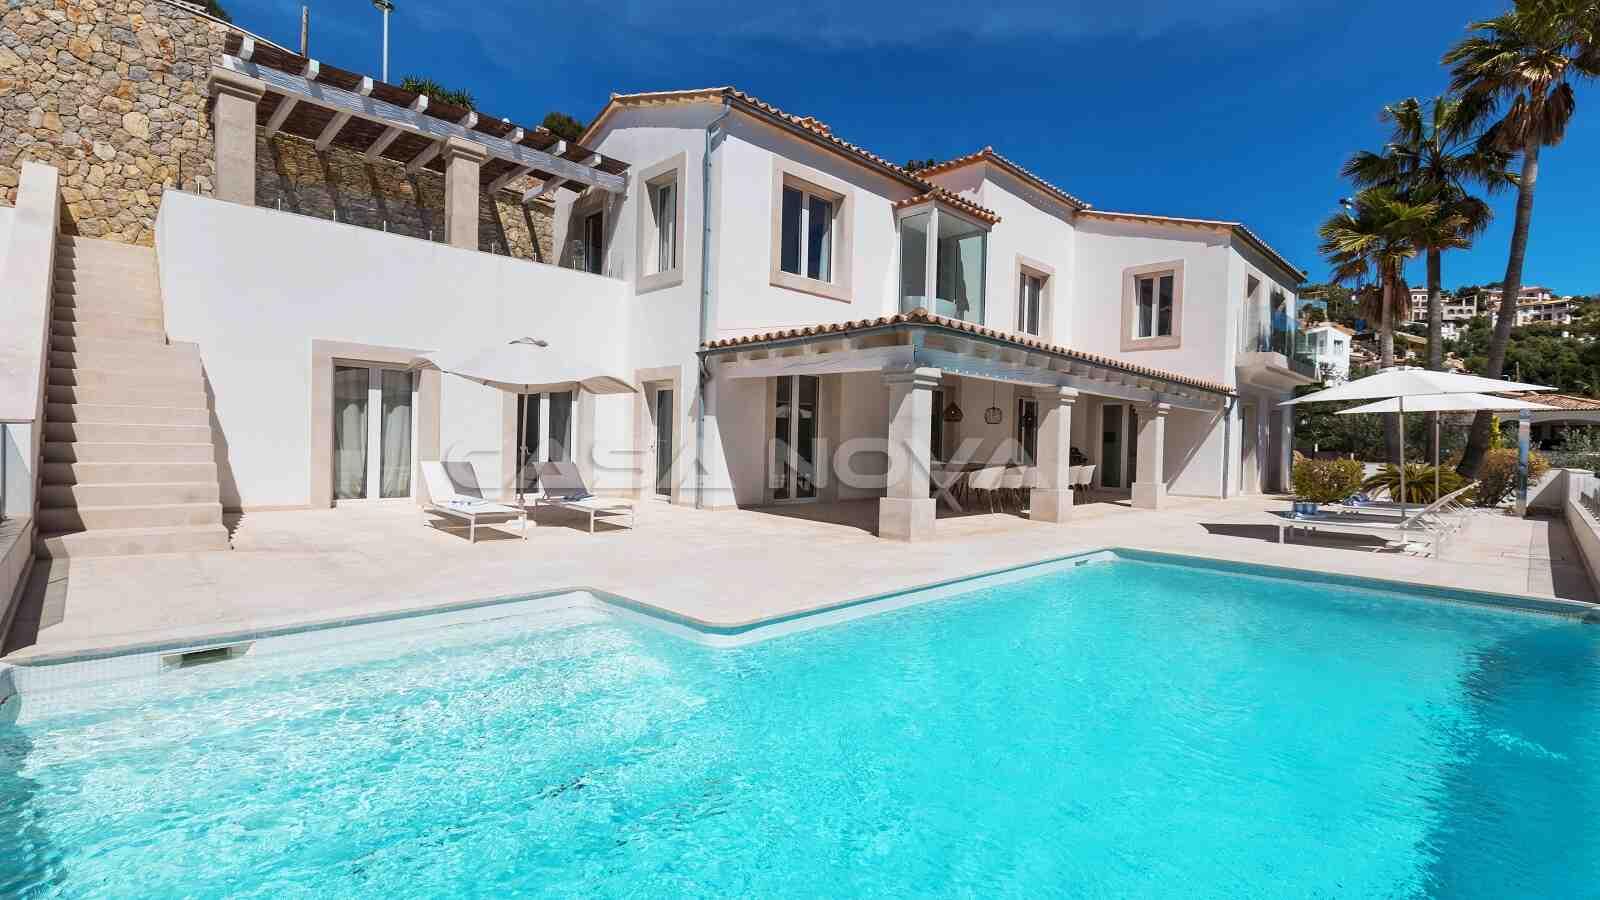 Moderne Mallorca Villa mit mediterranen Akzenten